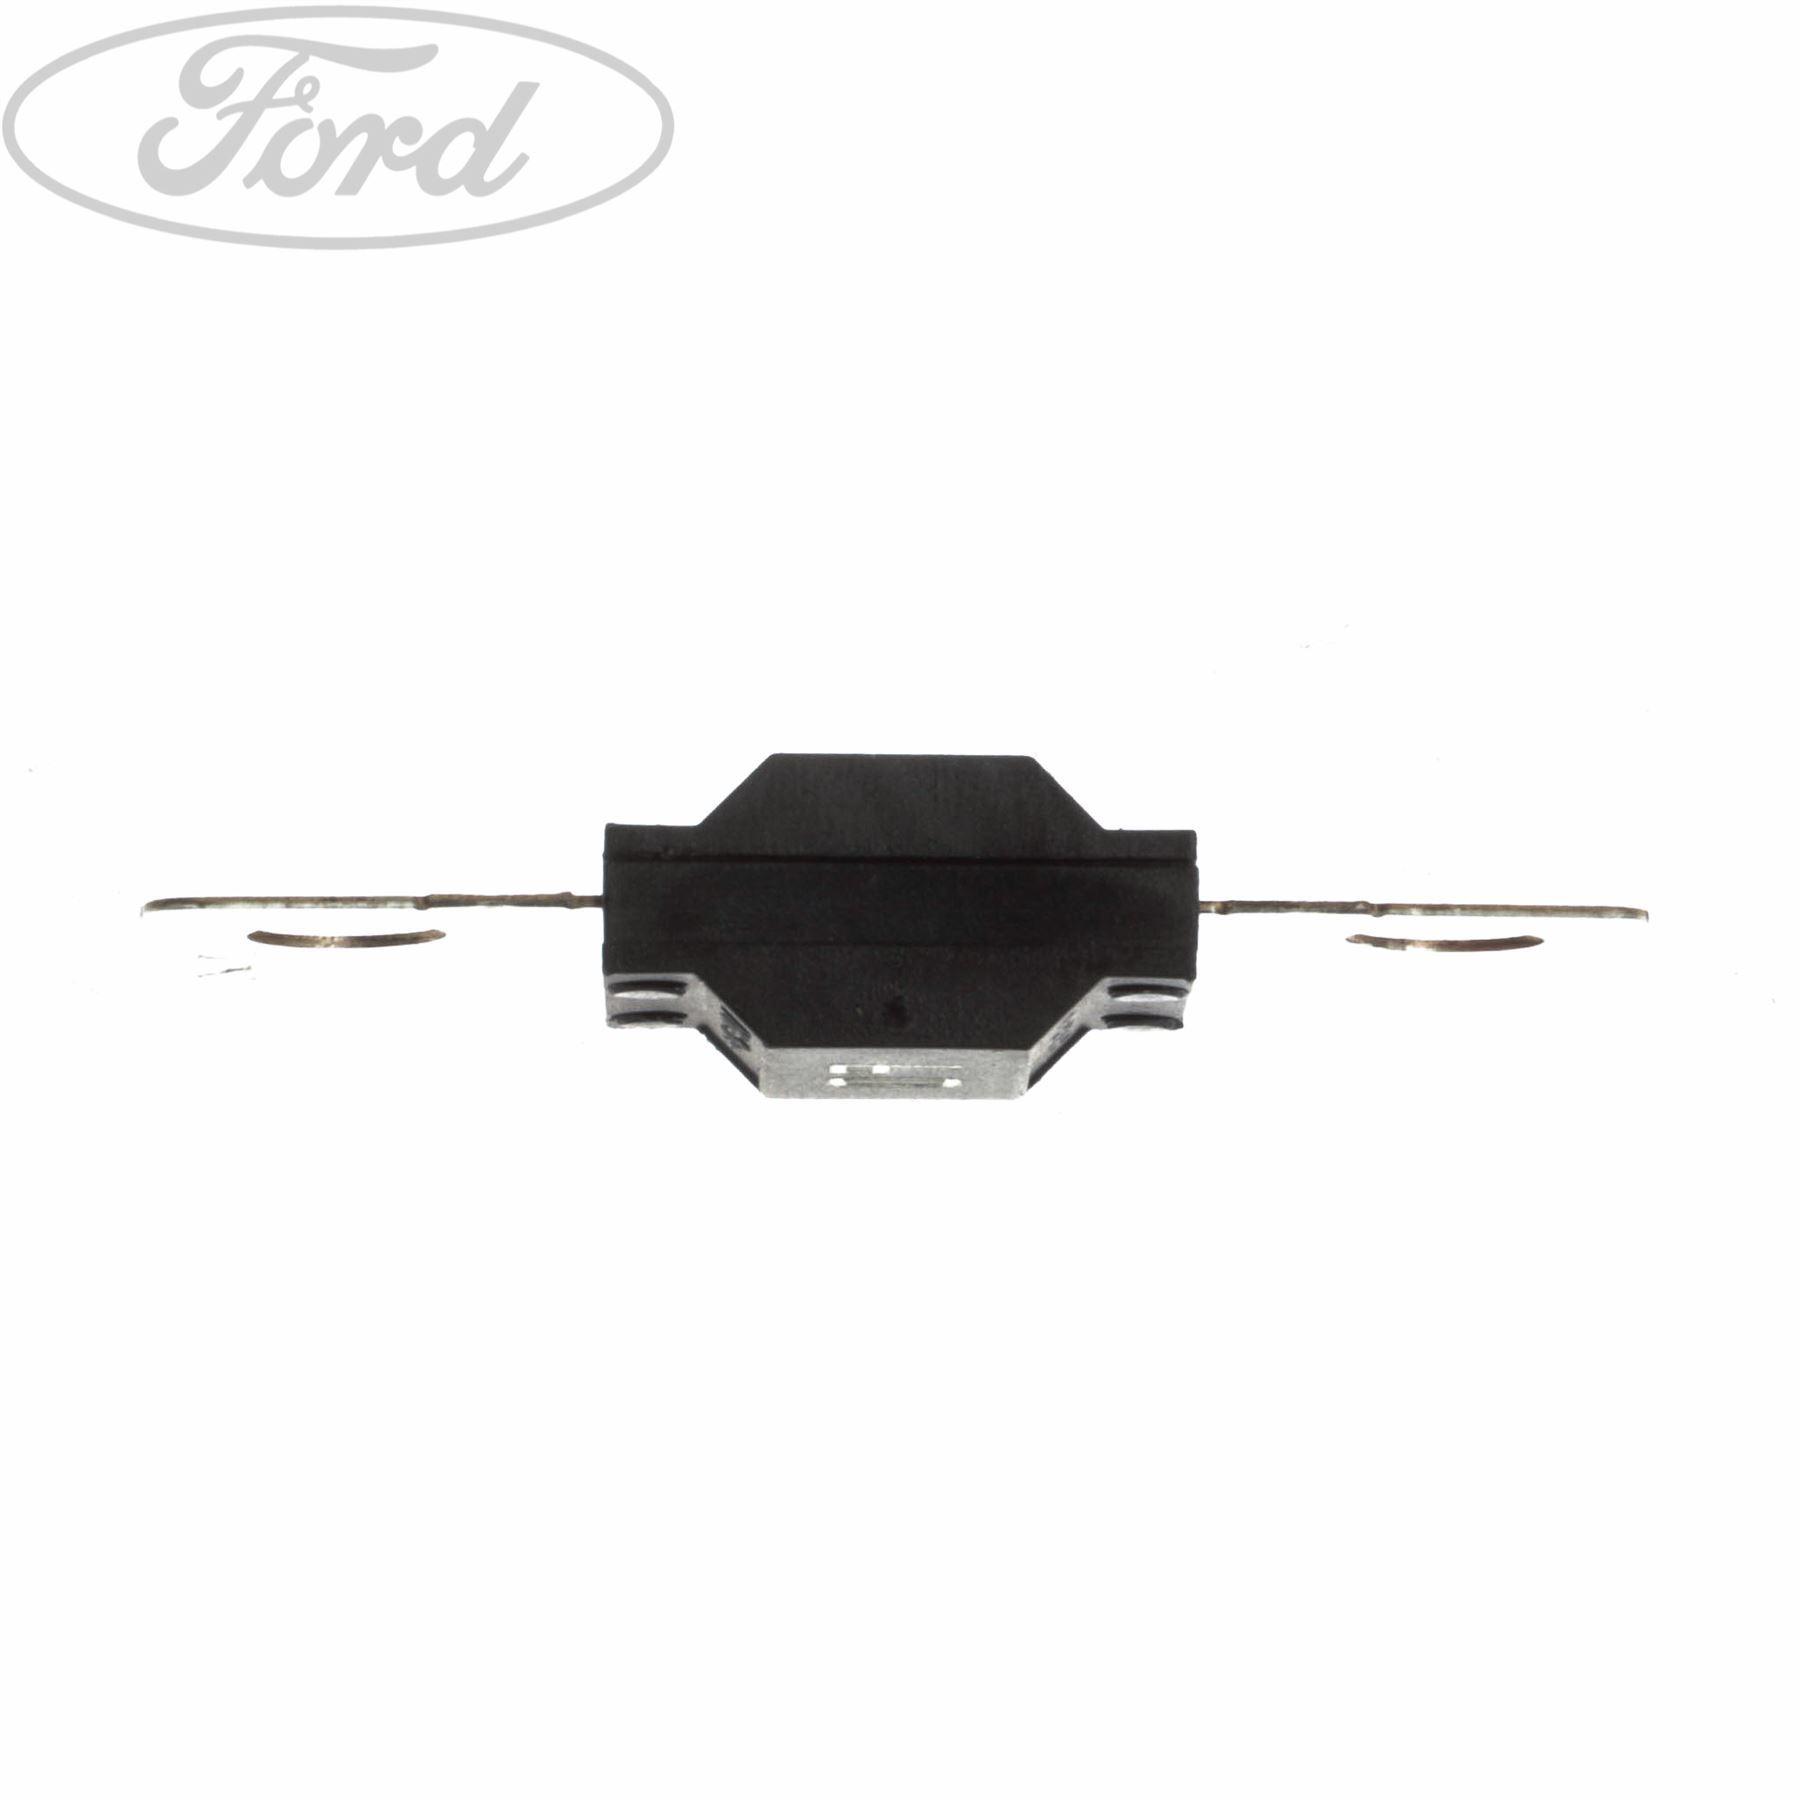 Genuine Ford Circuit Breaker 32 Volt 60 Amp Mega Fuse Yellow 1148214